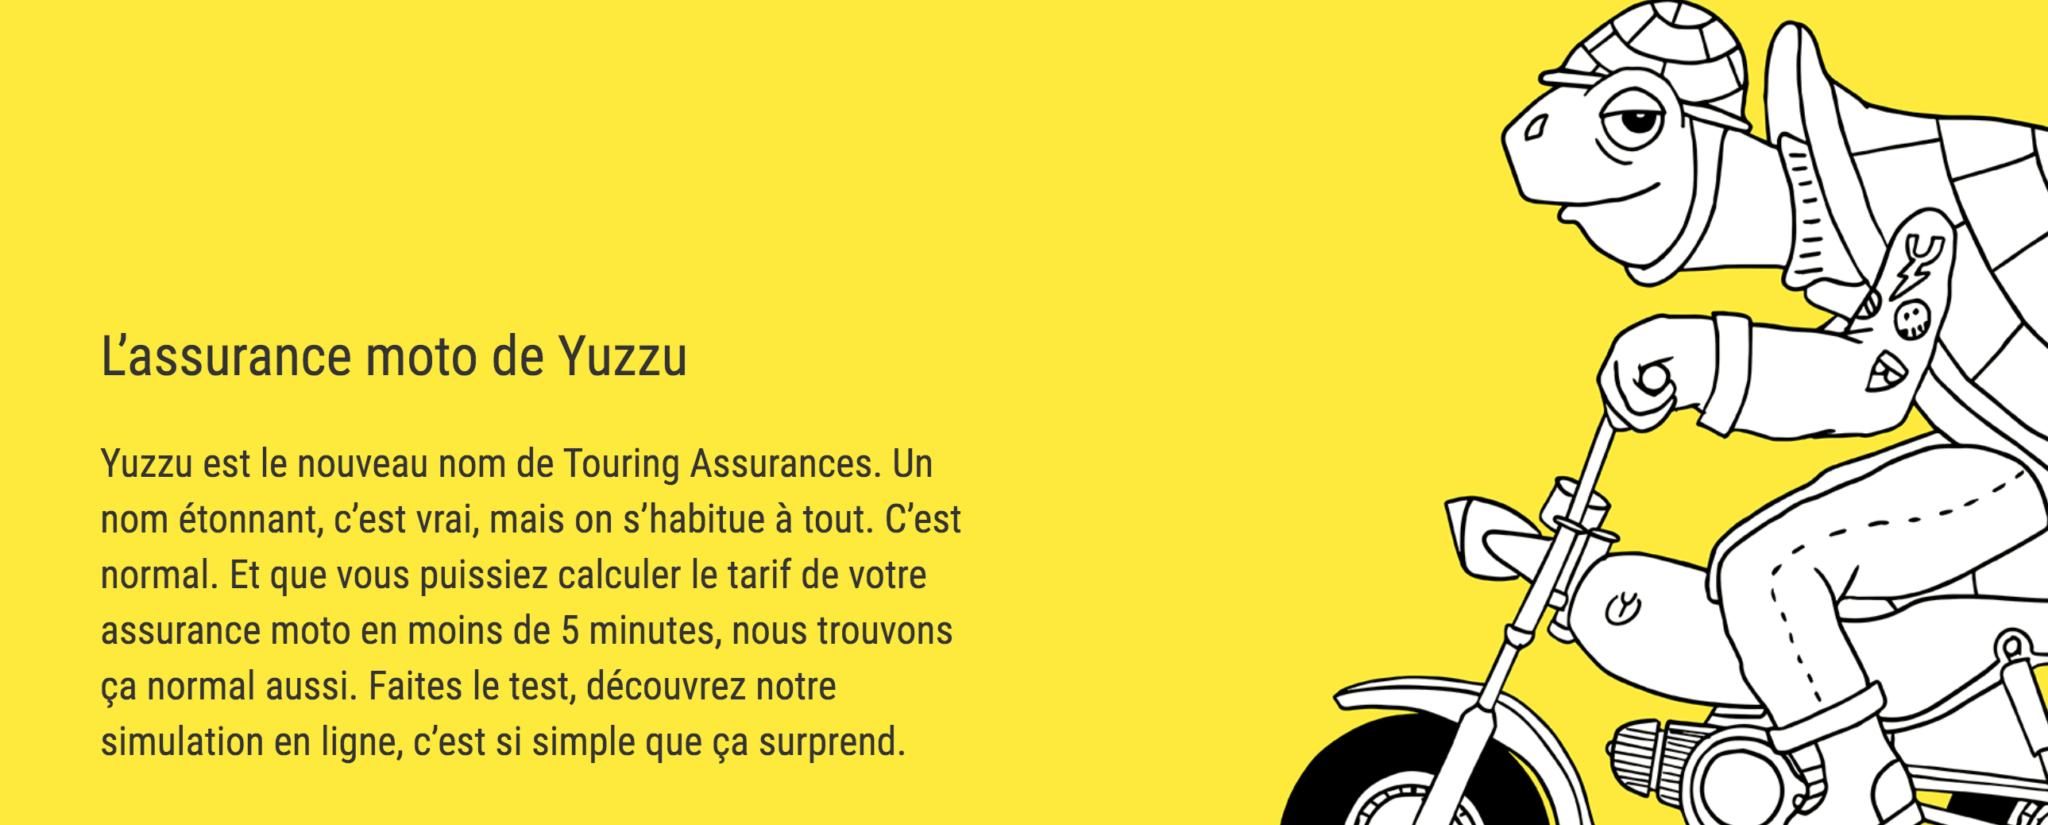 assurance moto yuzzu